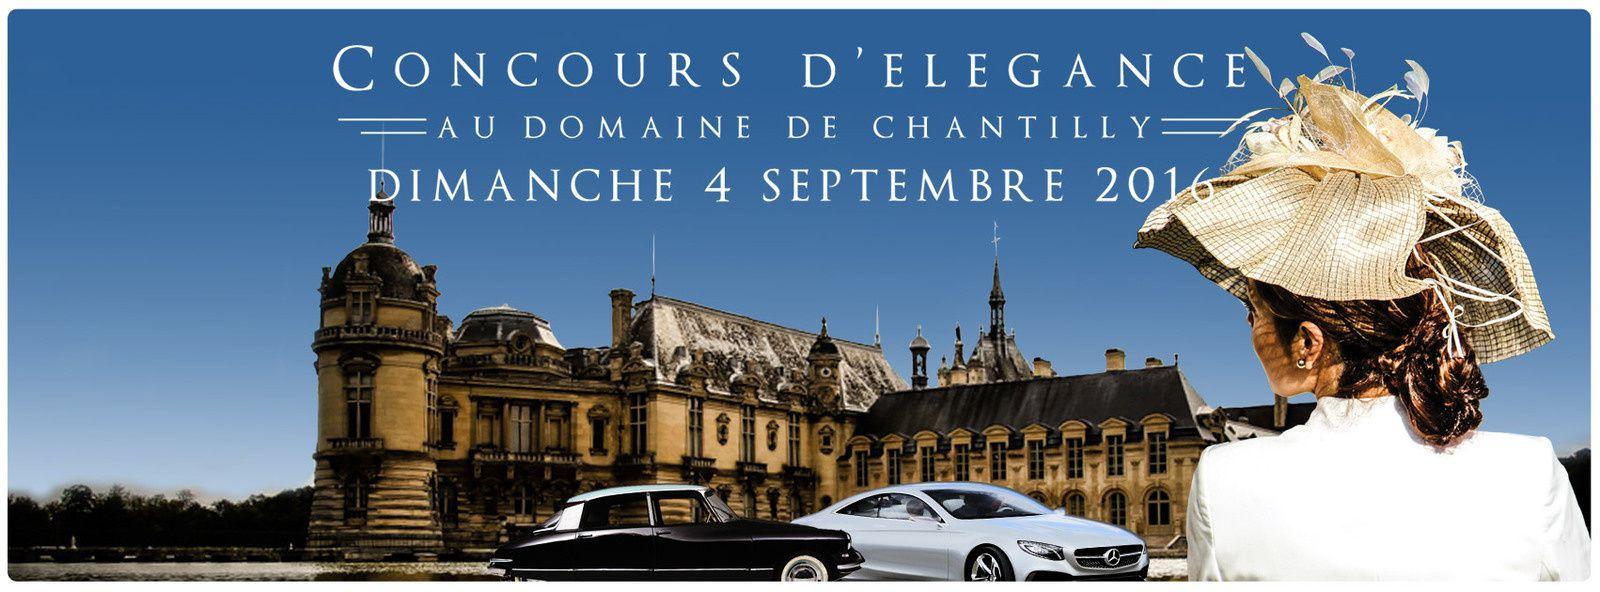 4 septembre 2016 : Chantilly Arts & Elegance Richard Mille